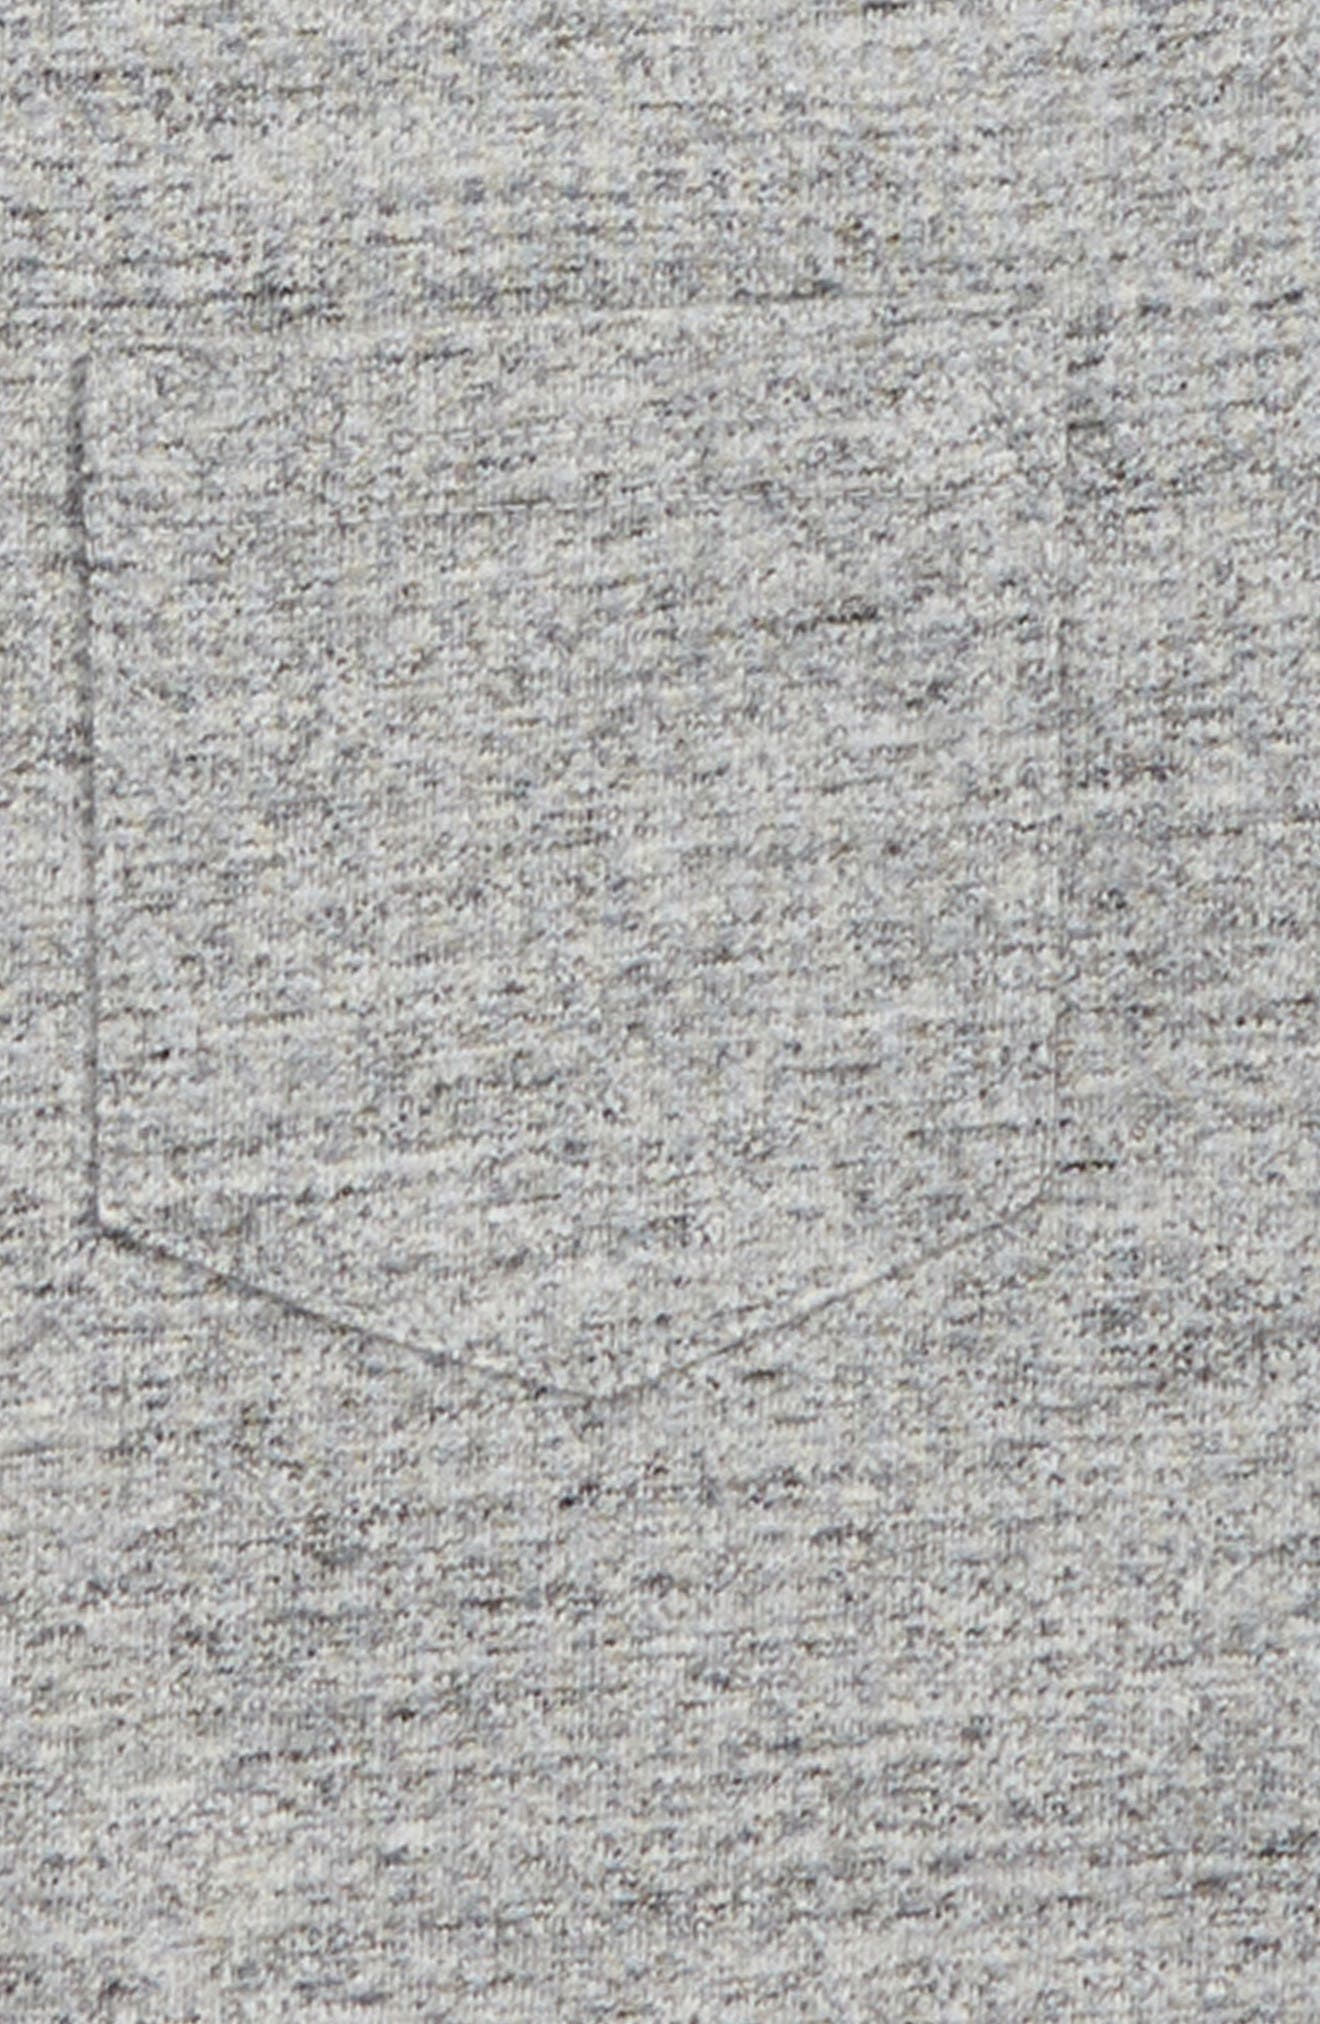 Stripe Raglan Sweatshirt,                             Alternate thumbnail 2, color,                             GREY MARL JASPE